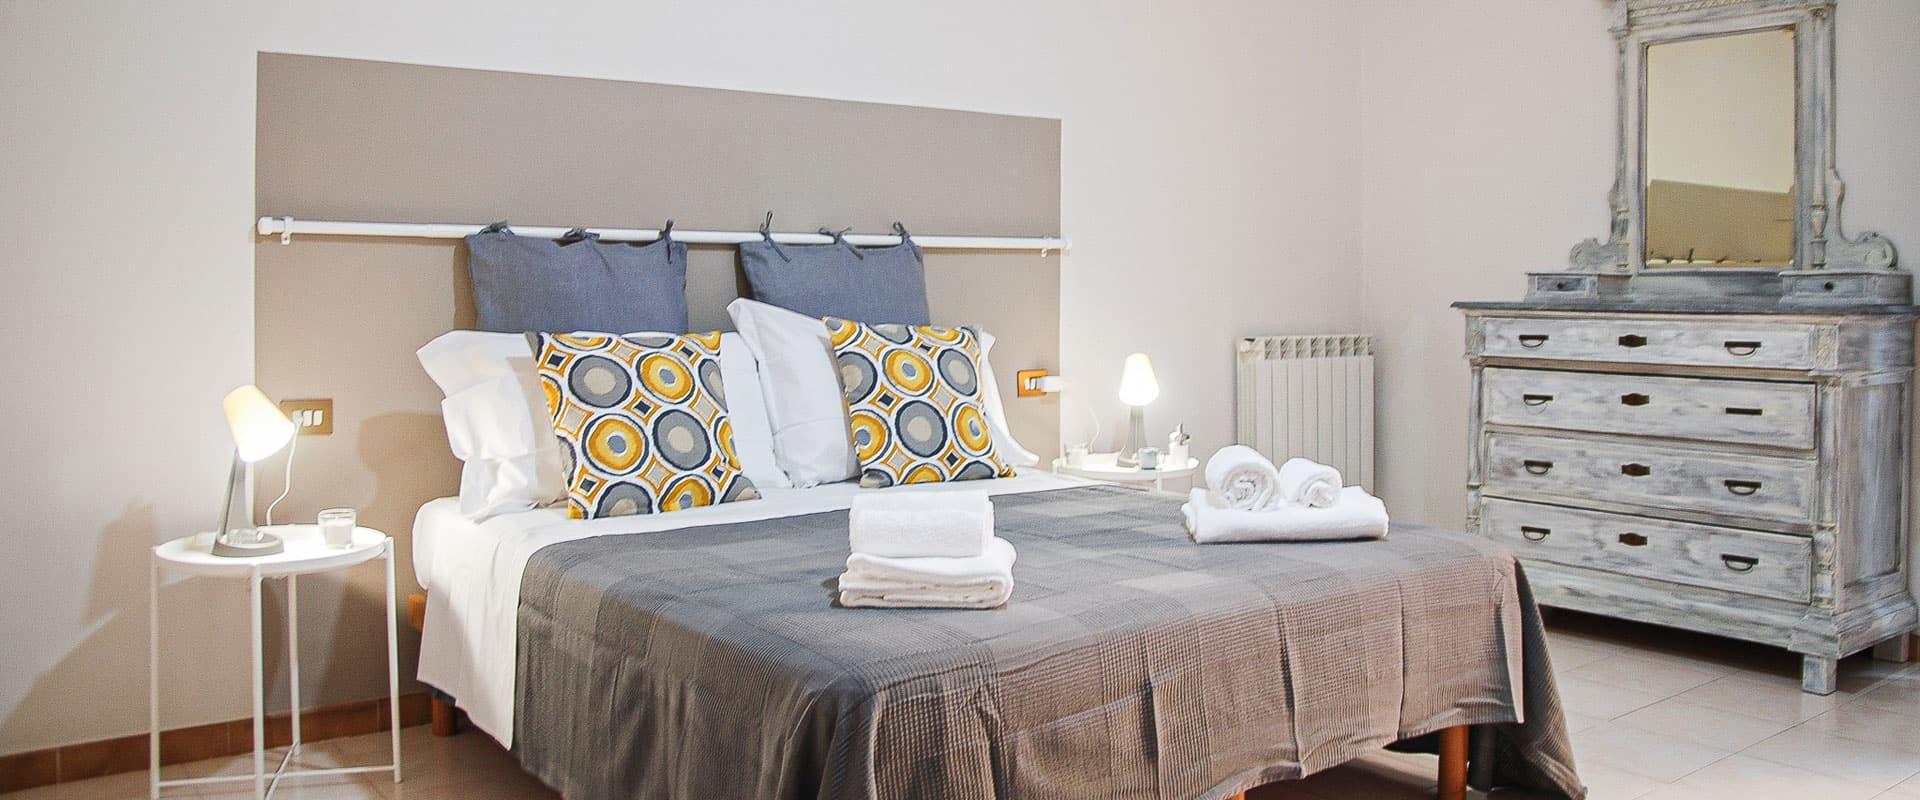 appartamento-cadore-milano